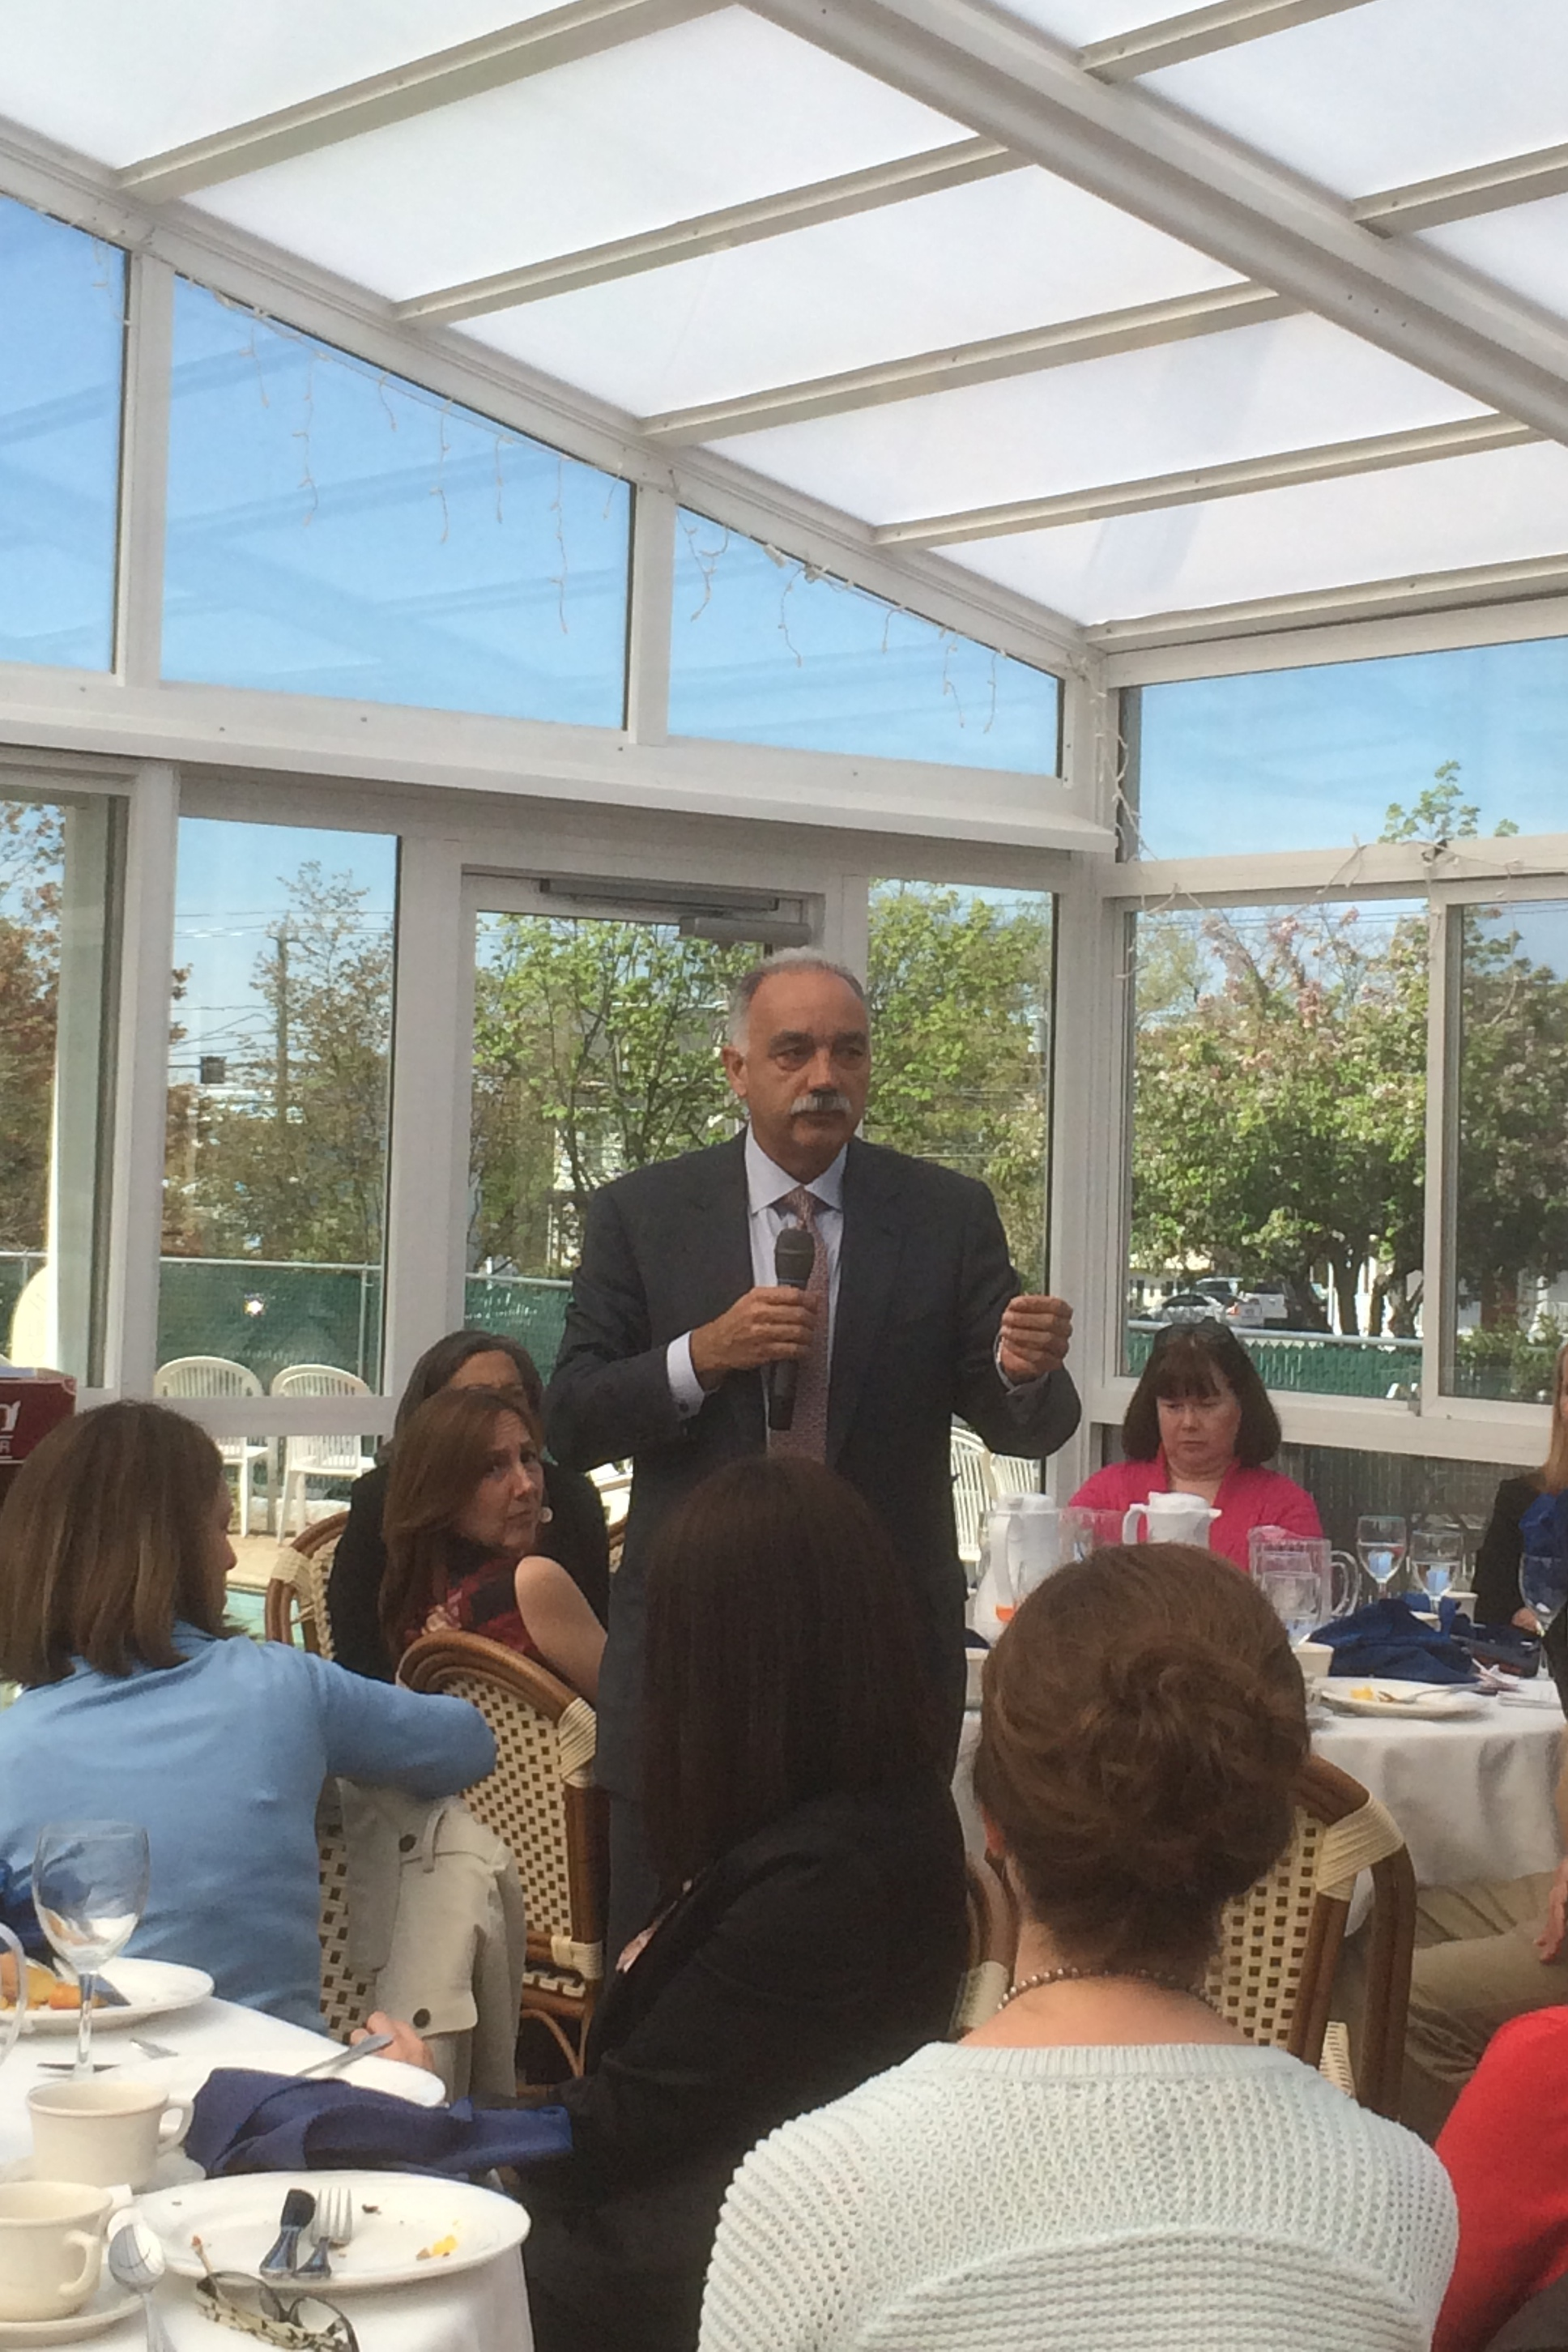 Norwalk's Schools Superintendent Manuel Rivera speaks at a meeting of the Mid Fairfield County Association of Realtors.